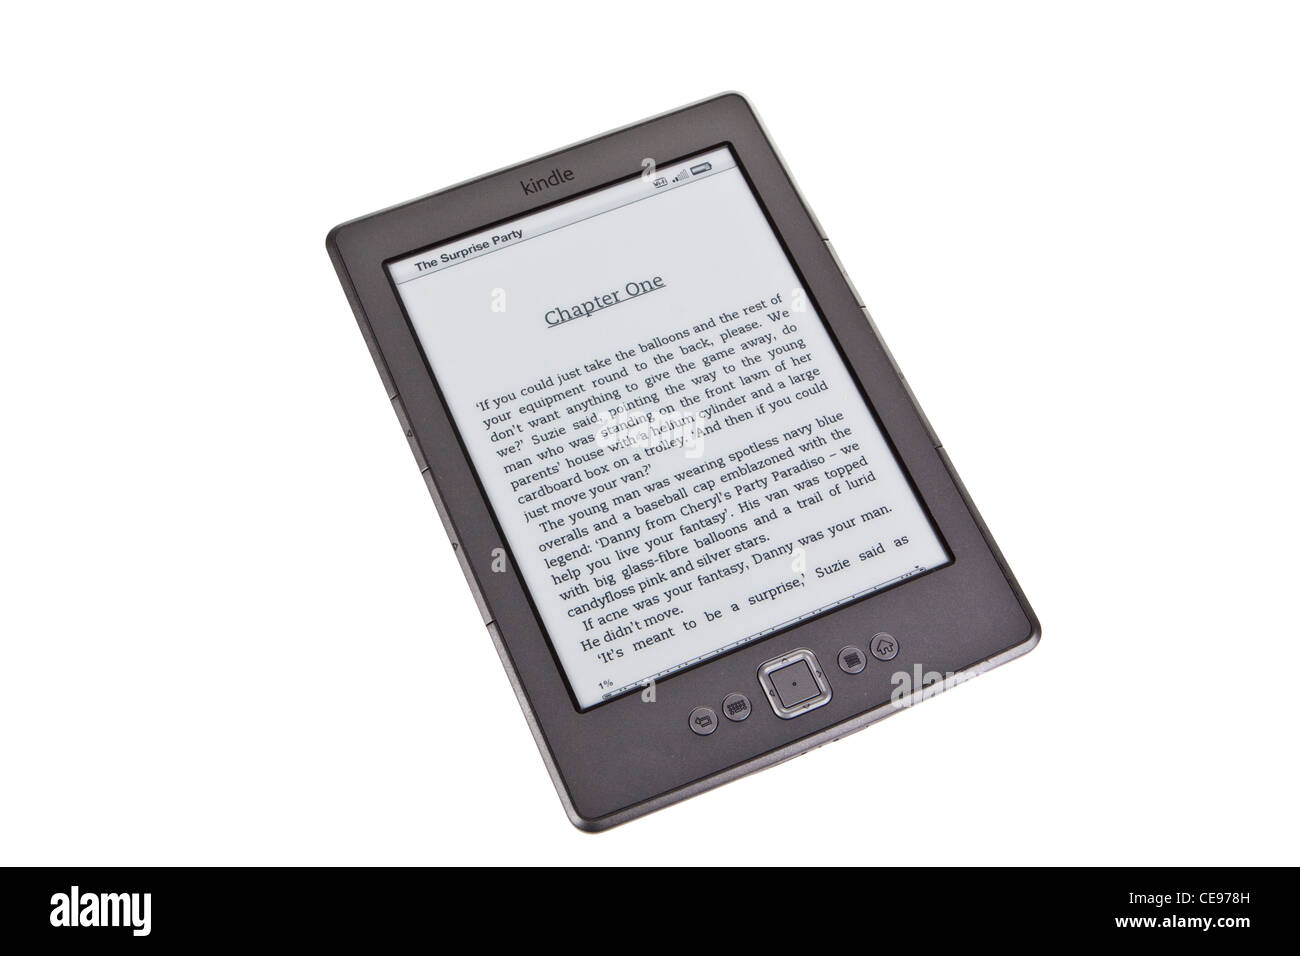 Kindle Ereader Ereader Tablet Amazon Wi Fi Stockfoto Bild 43229217